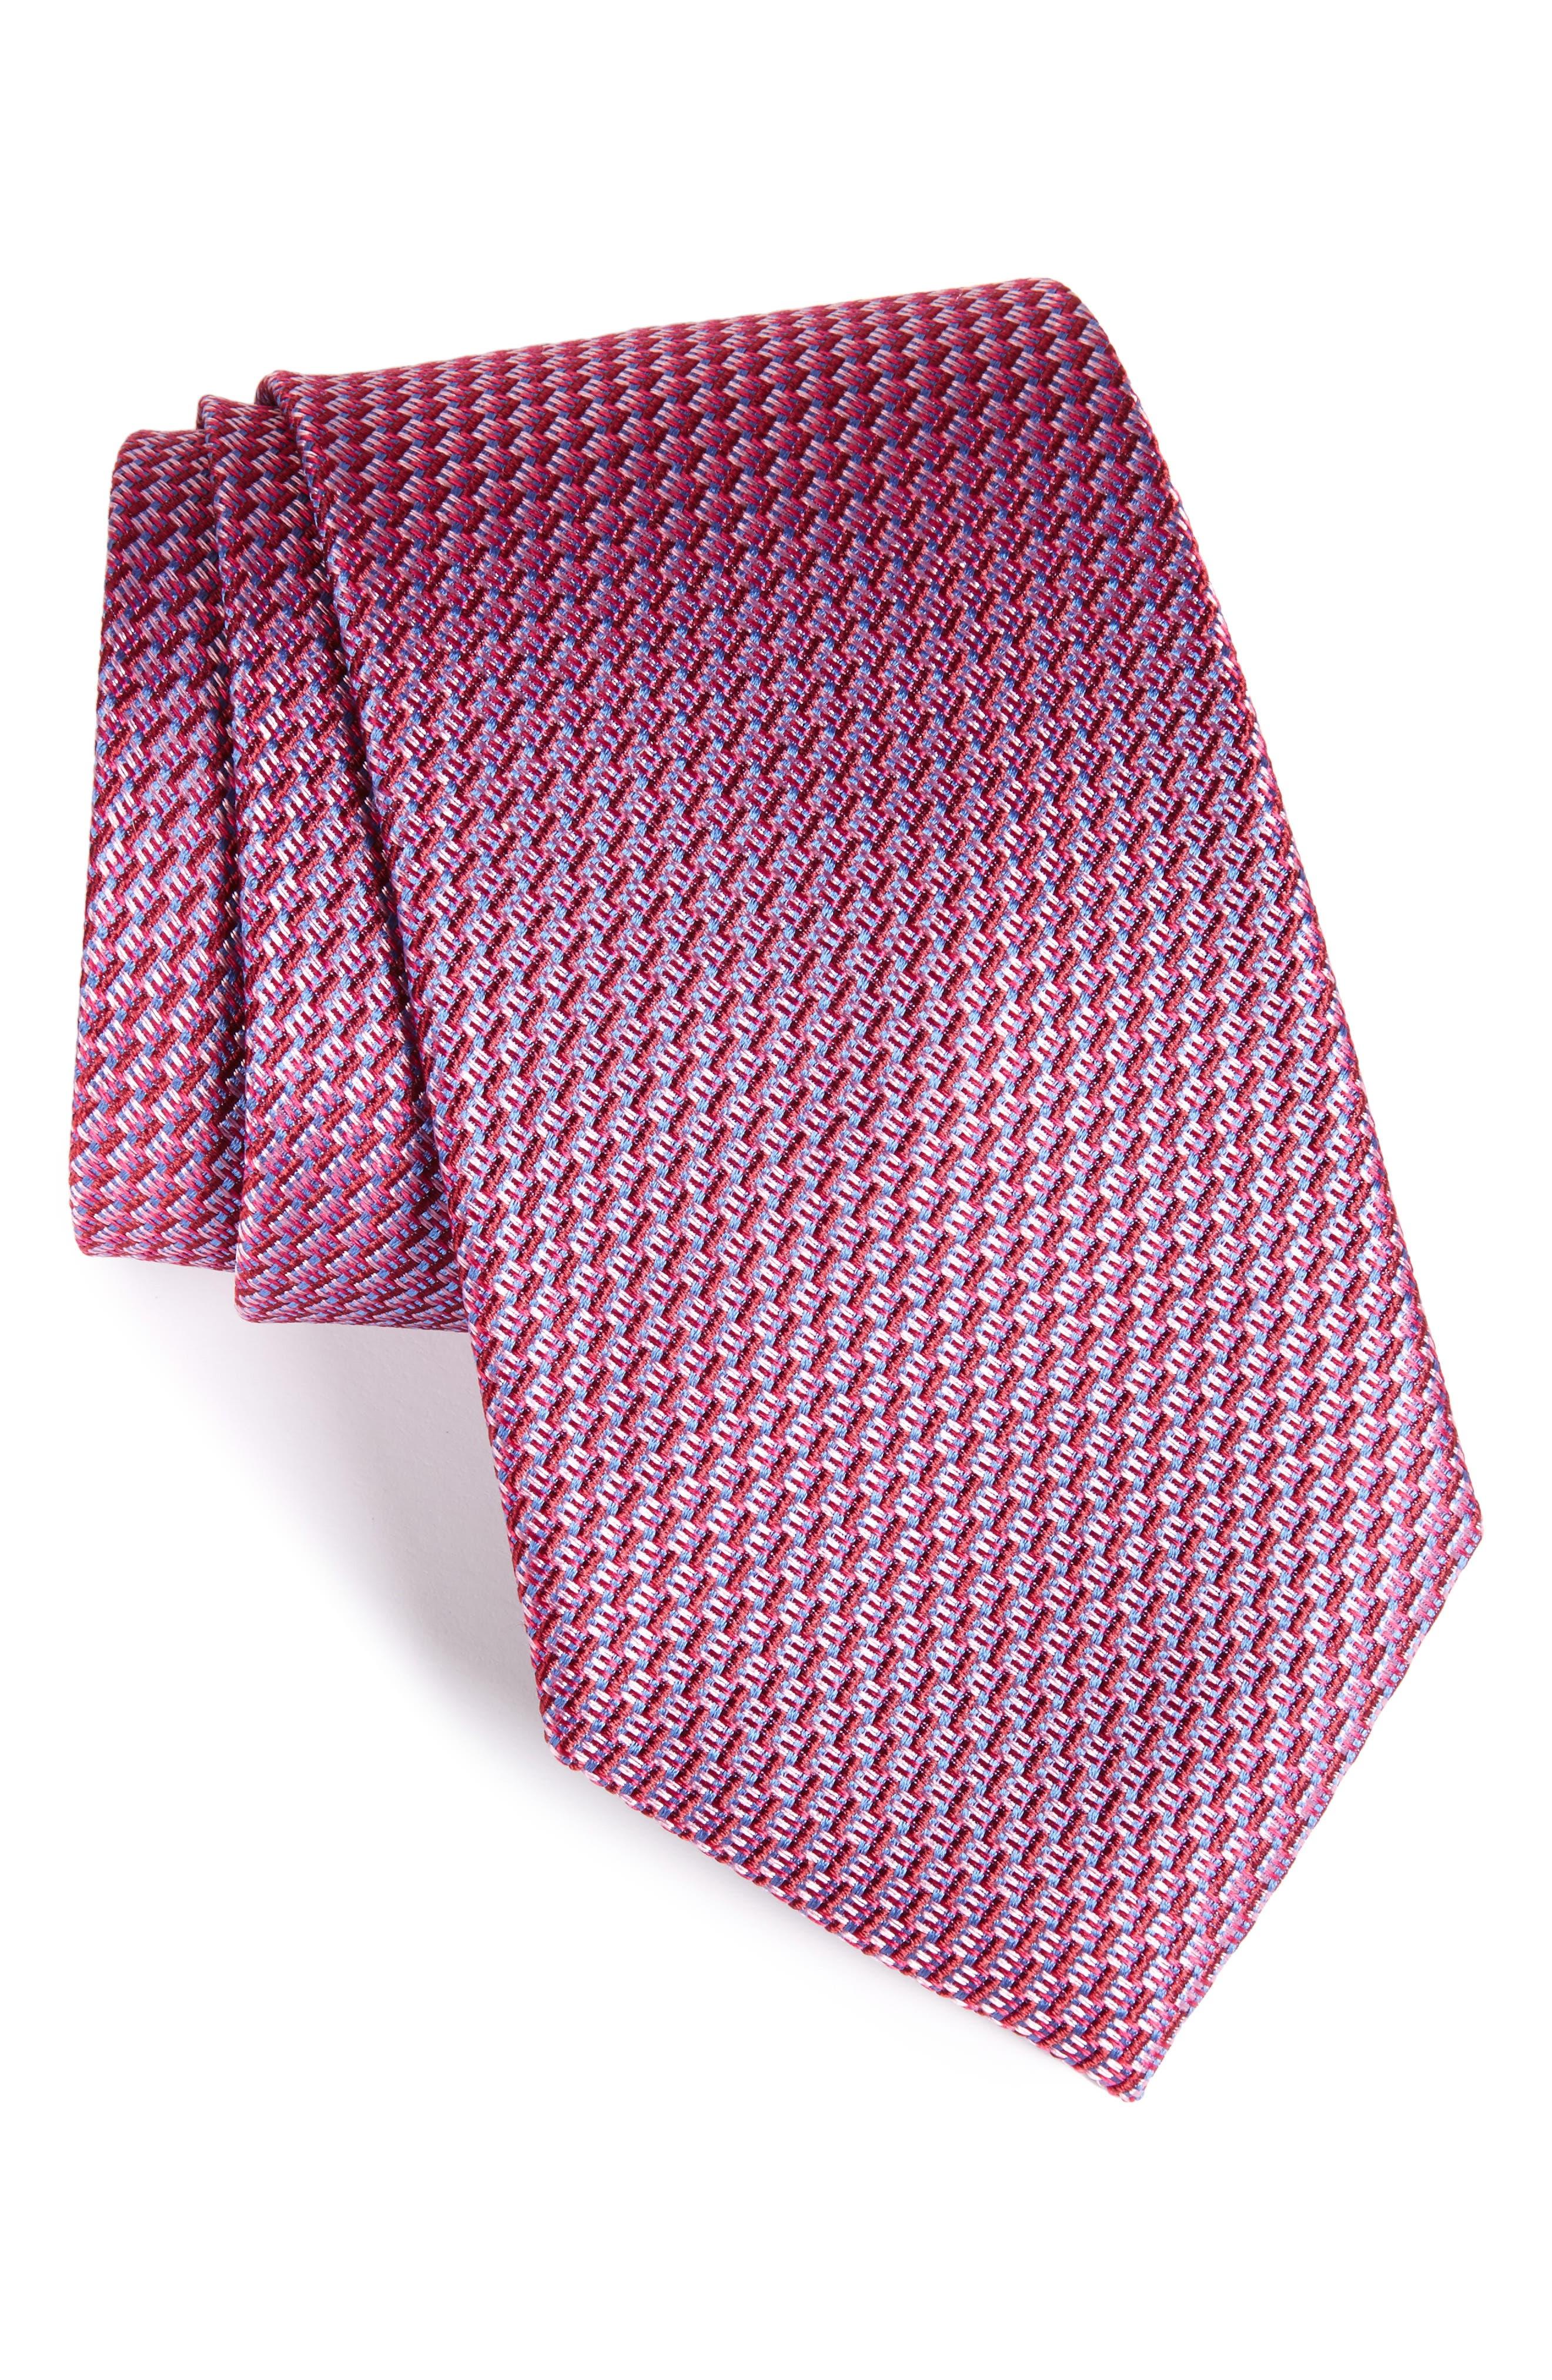 Tech Woven Silk Tie,                         Main,                         color, Pink